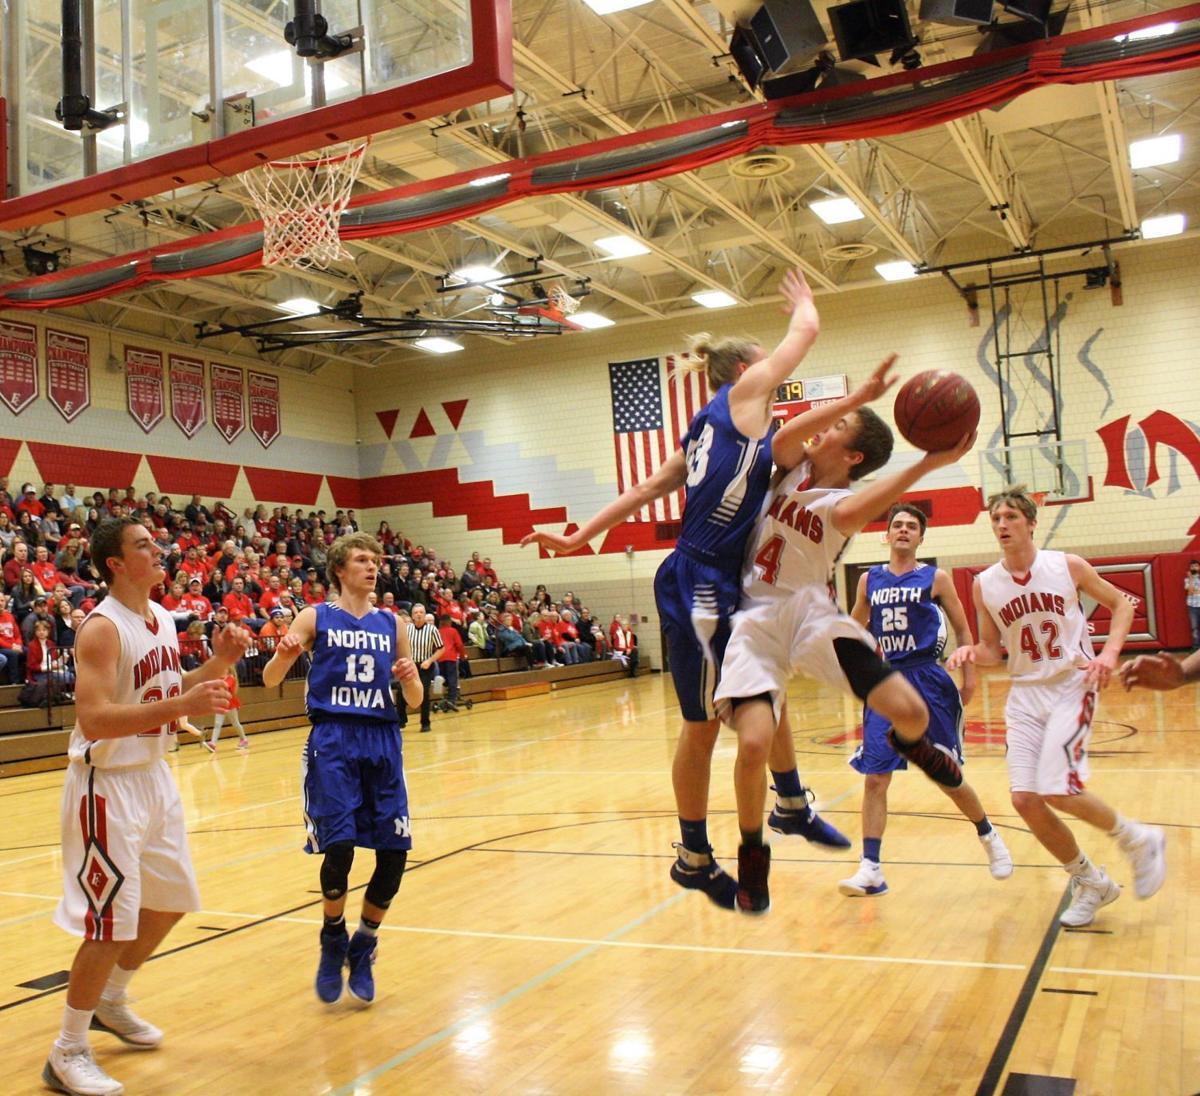 Basketball - North Iowa (513).JPG